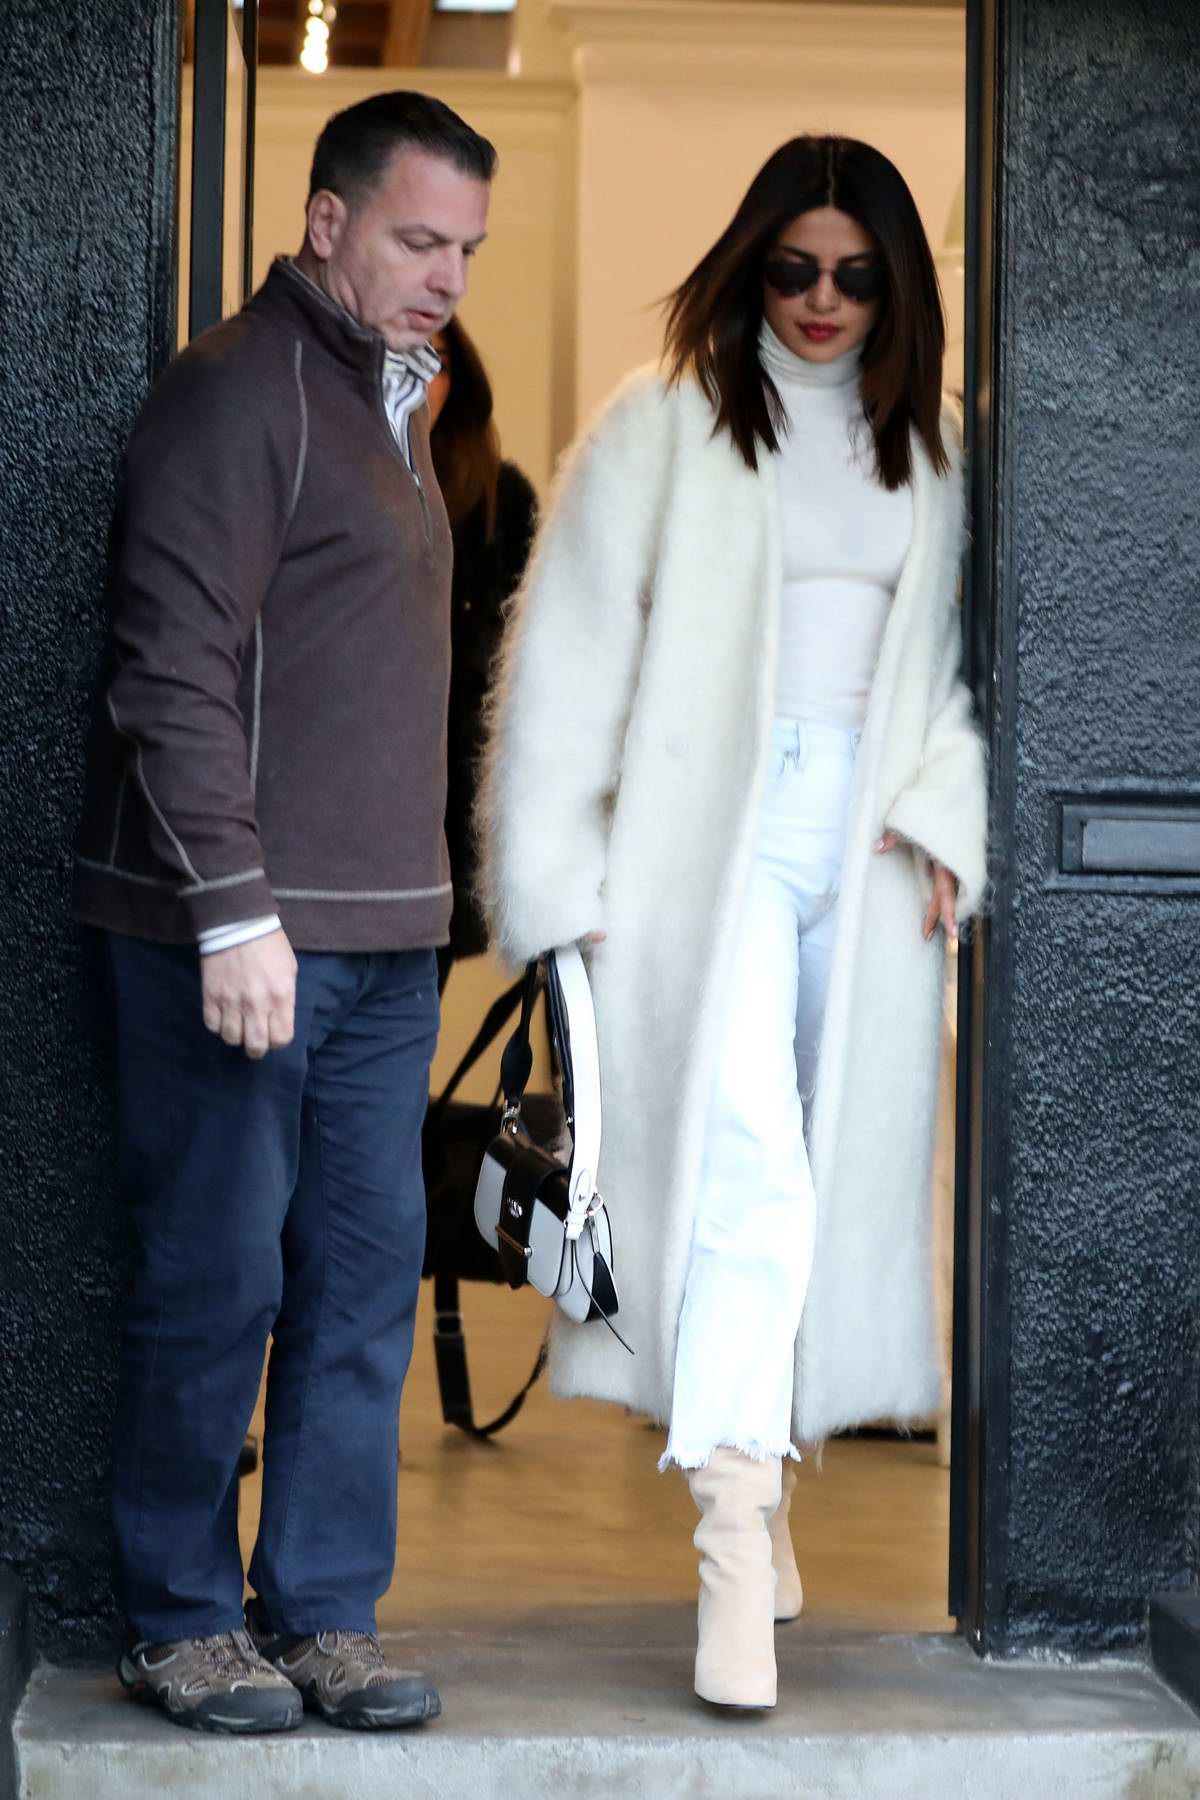 Priyanka Chopra Jonas leaves a Hair Salon clad in American Eagle Jeans in Los Angeles